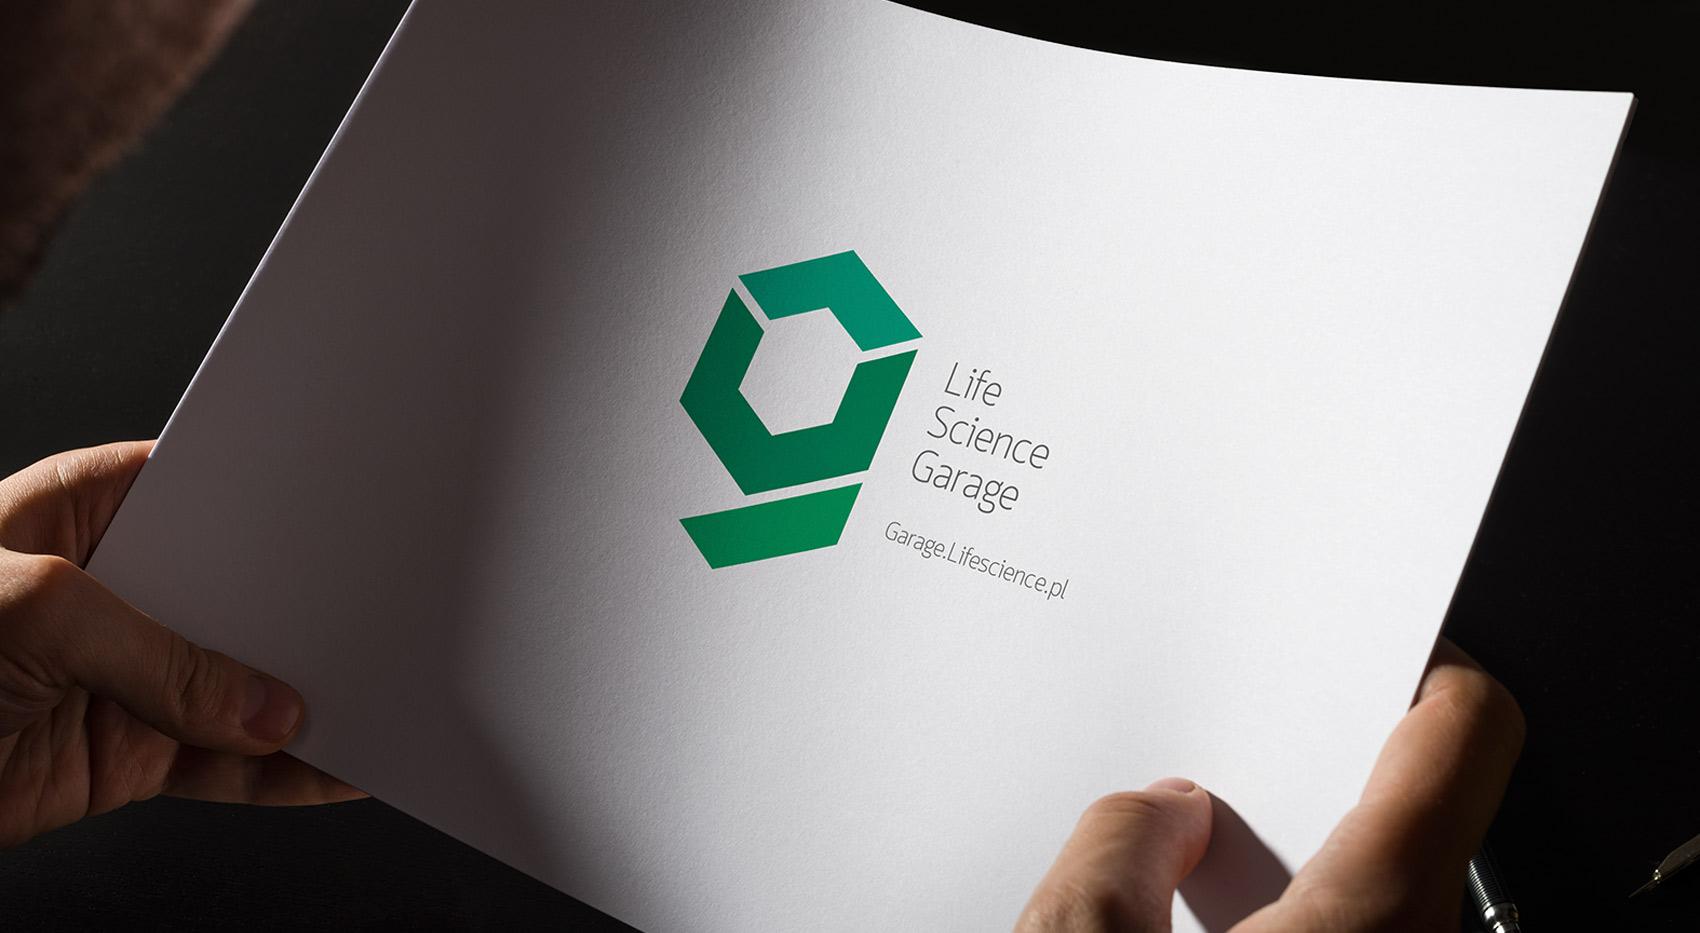 Garage  Life Science